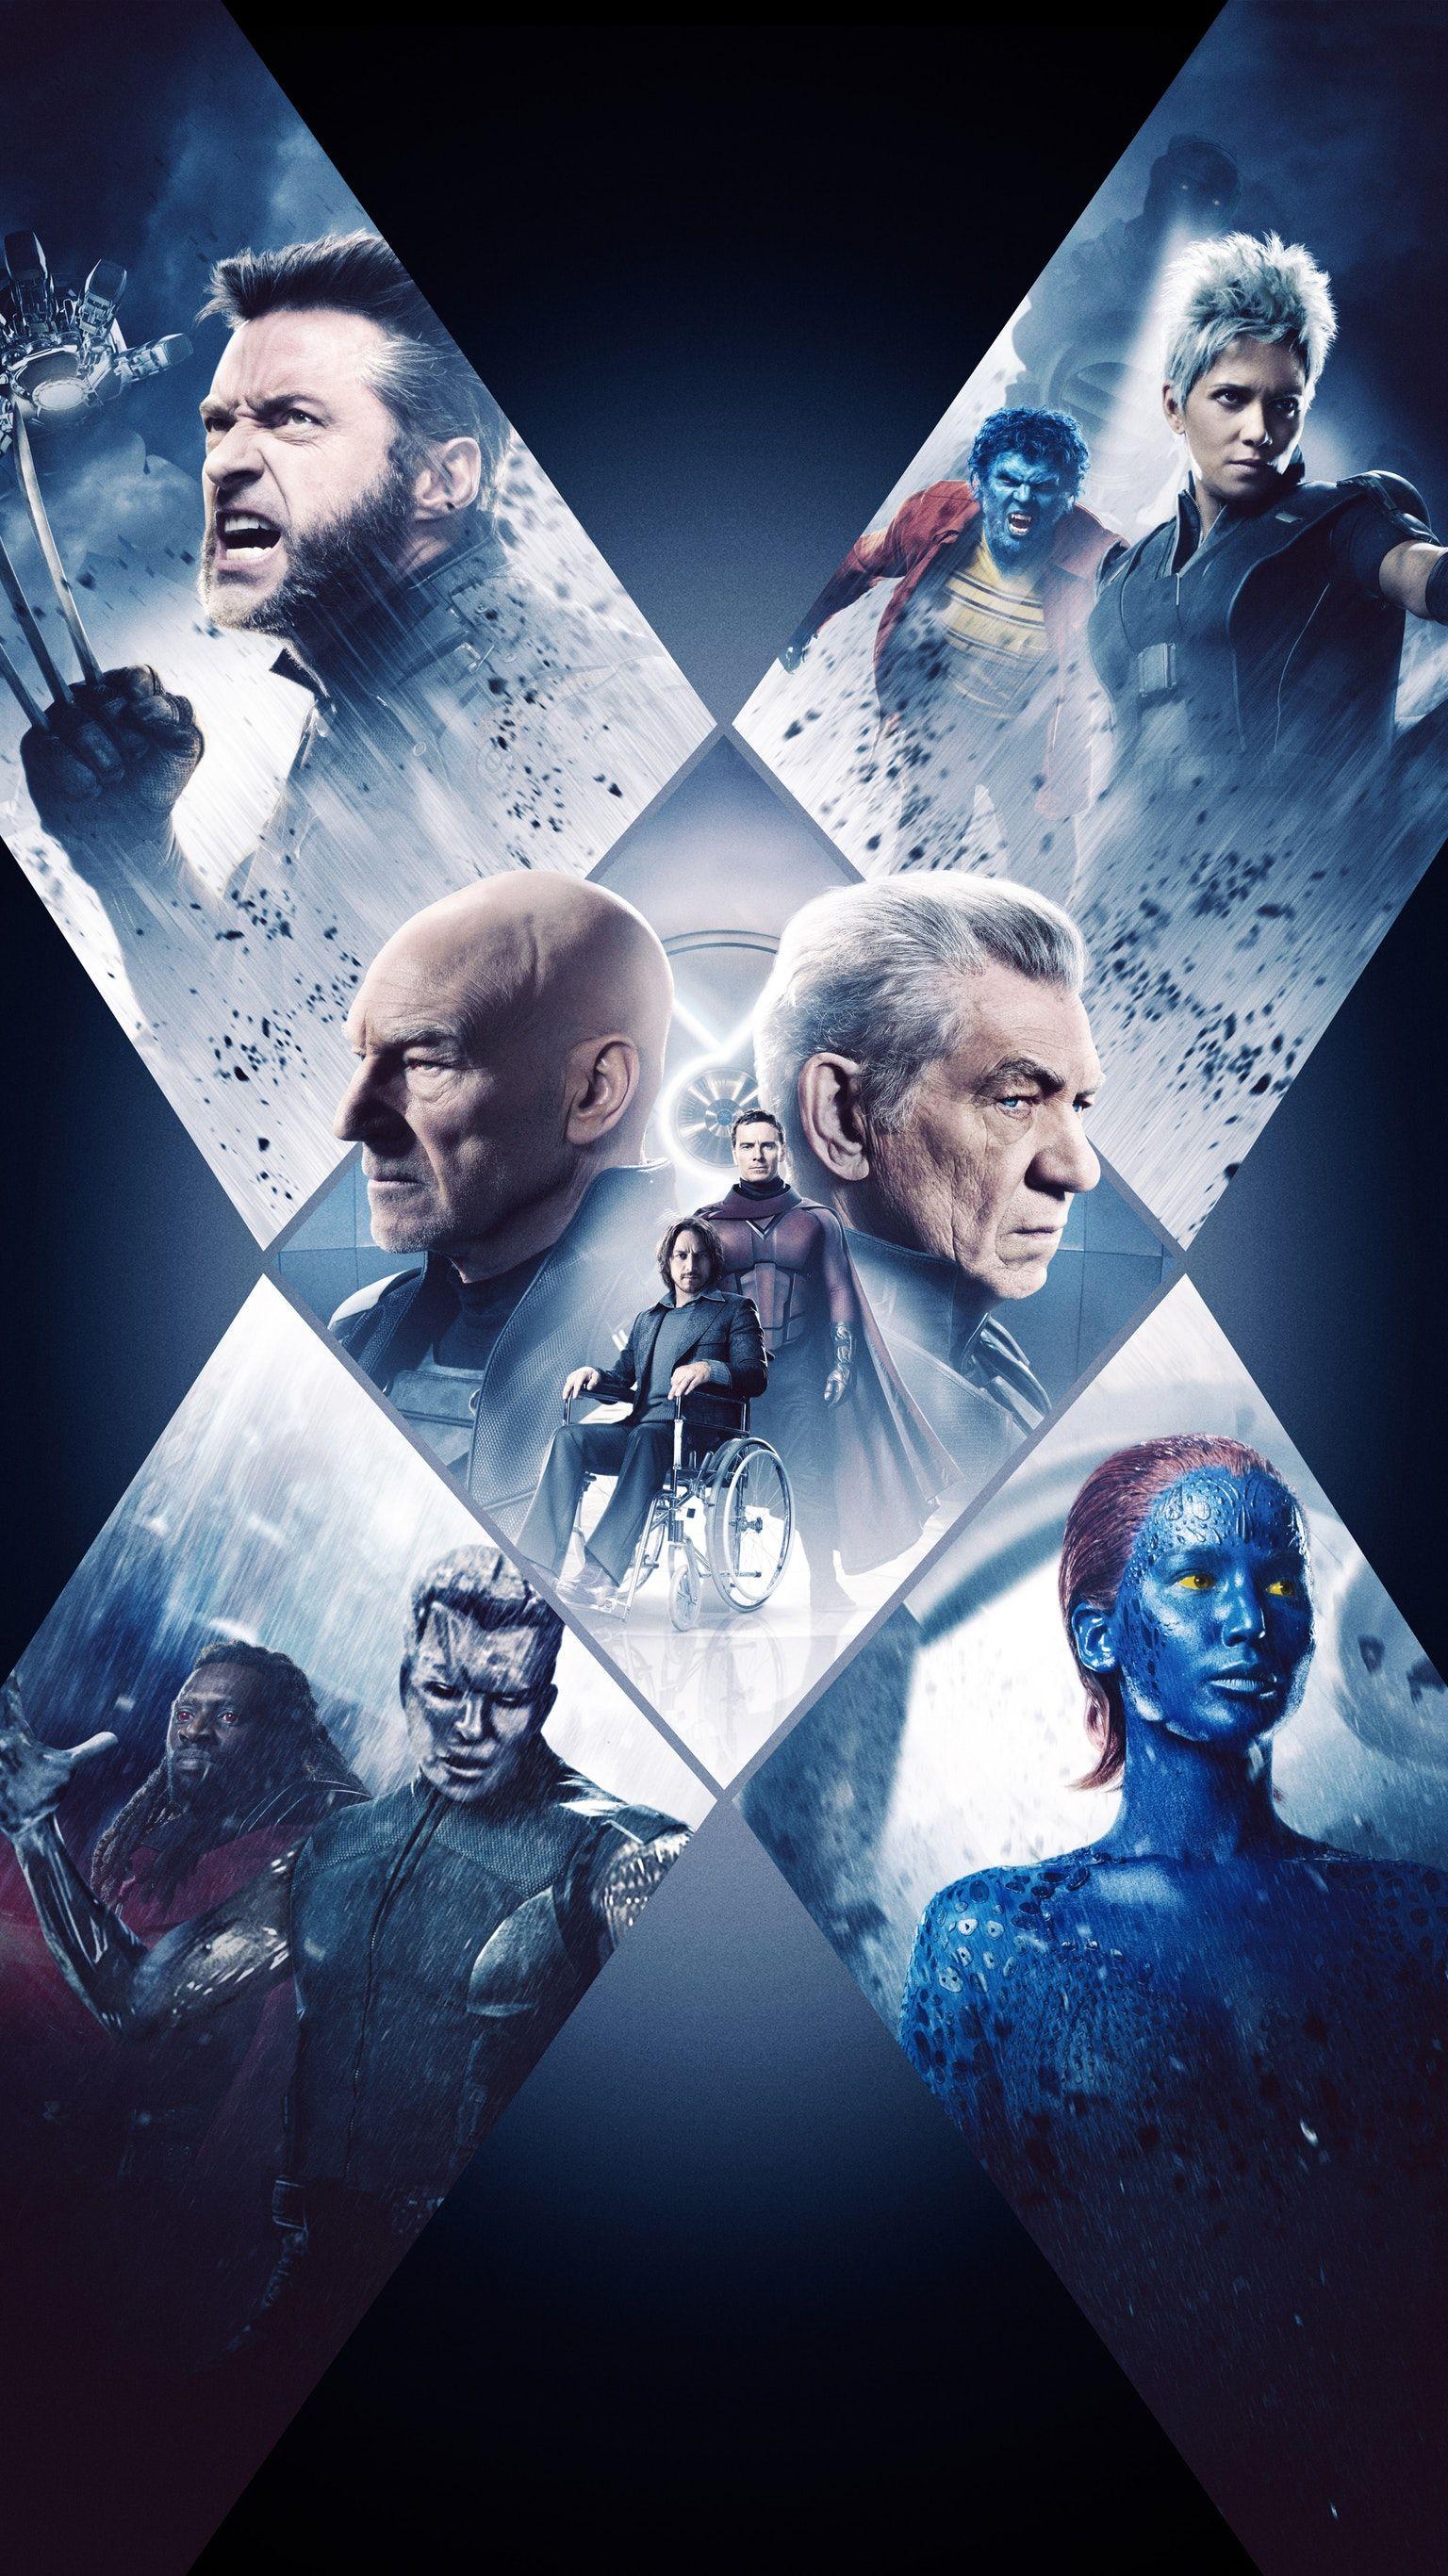 X Men Days Of Future Past 2014 Phone Wallpaper X Men